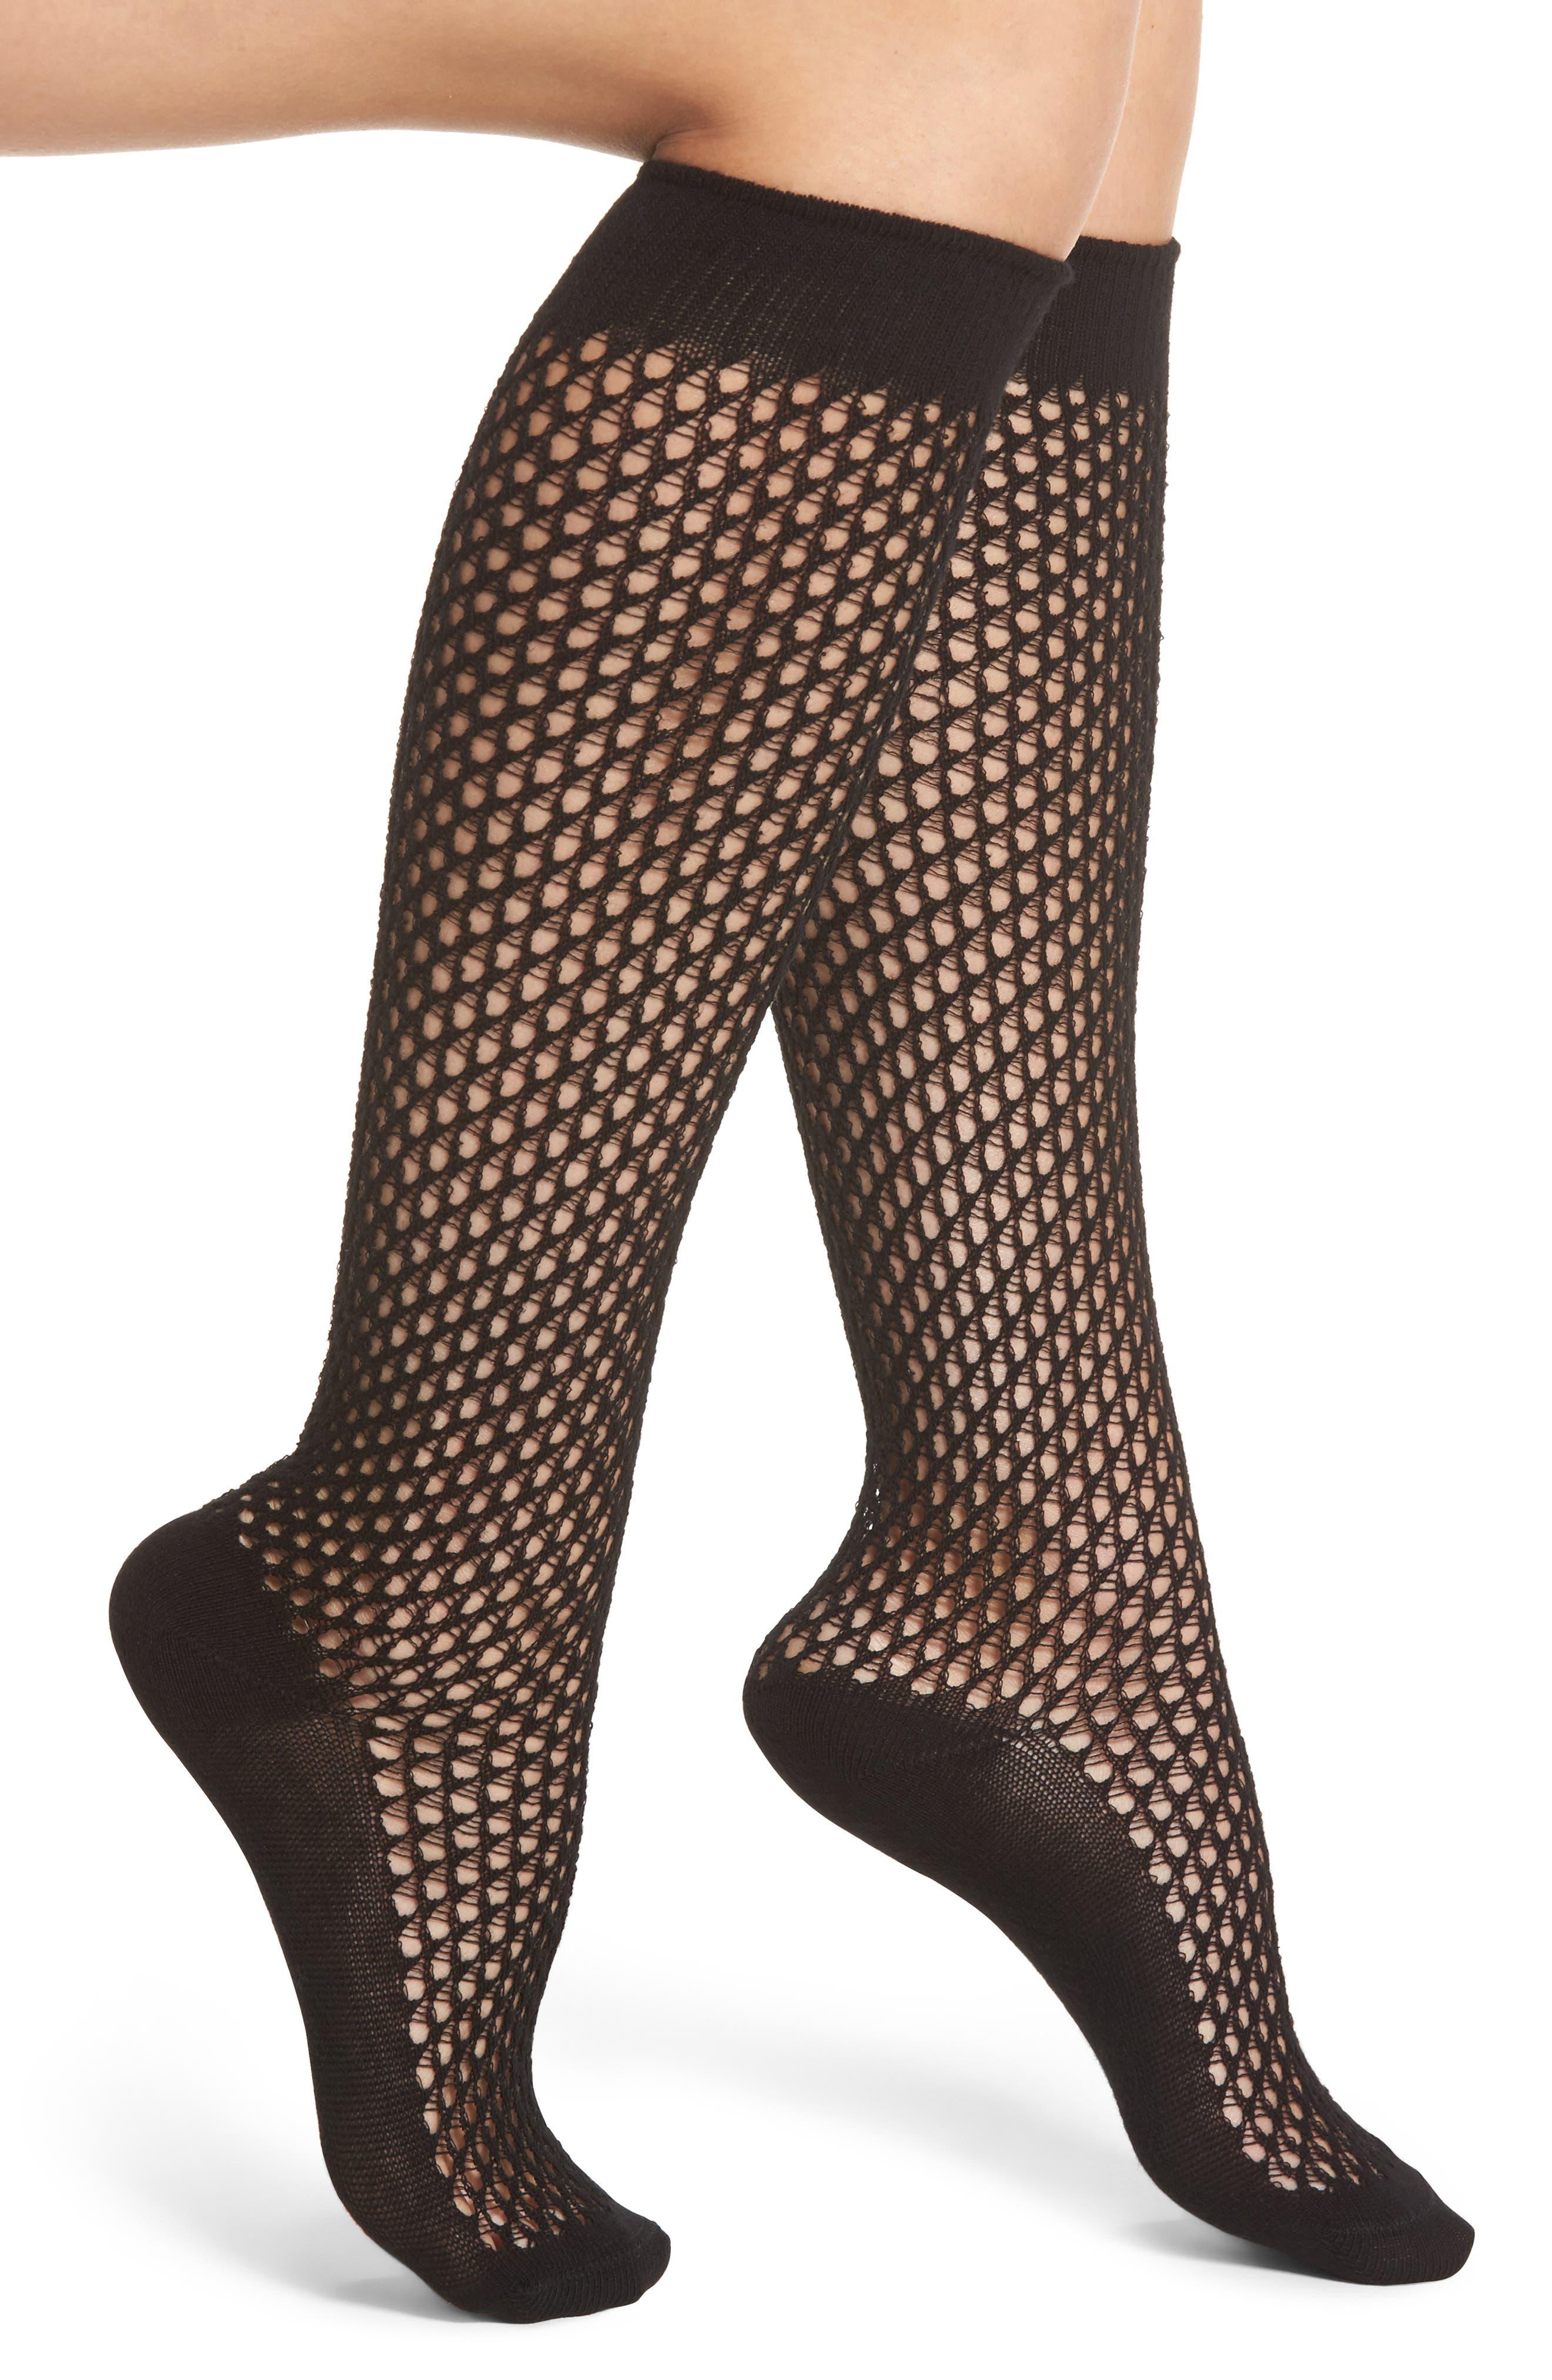 Gabmaletto Fishnet Knee High Socks,                             Main thumbnail 1, color,                             001